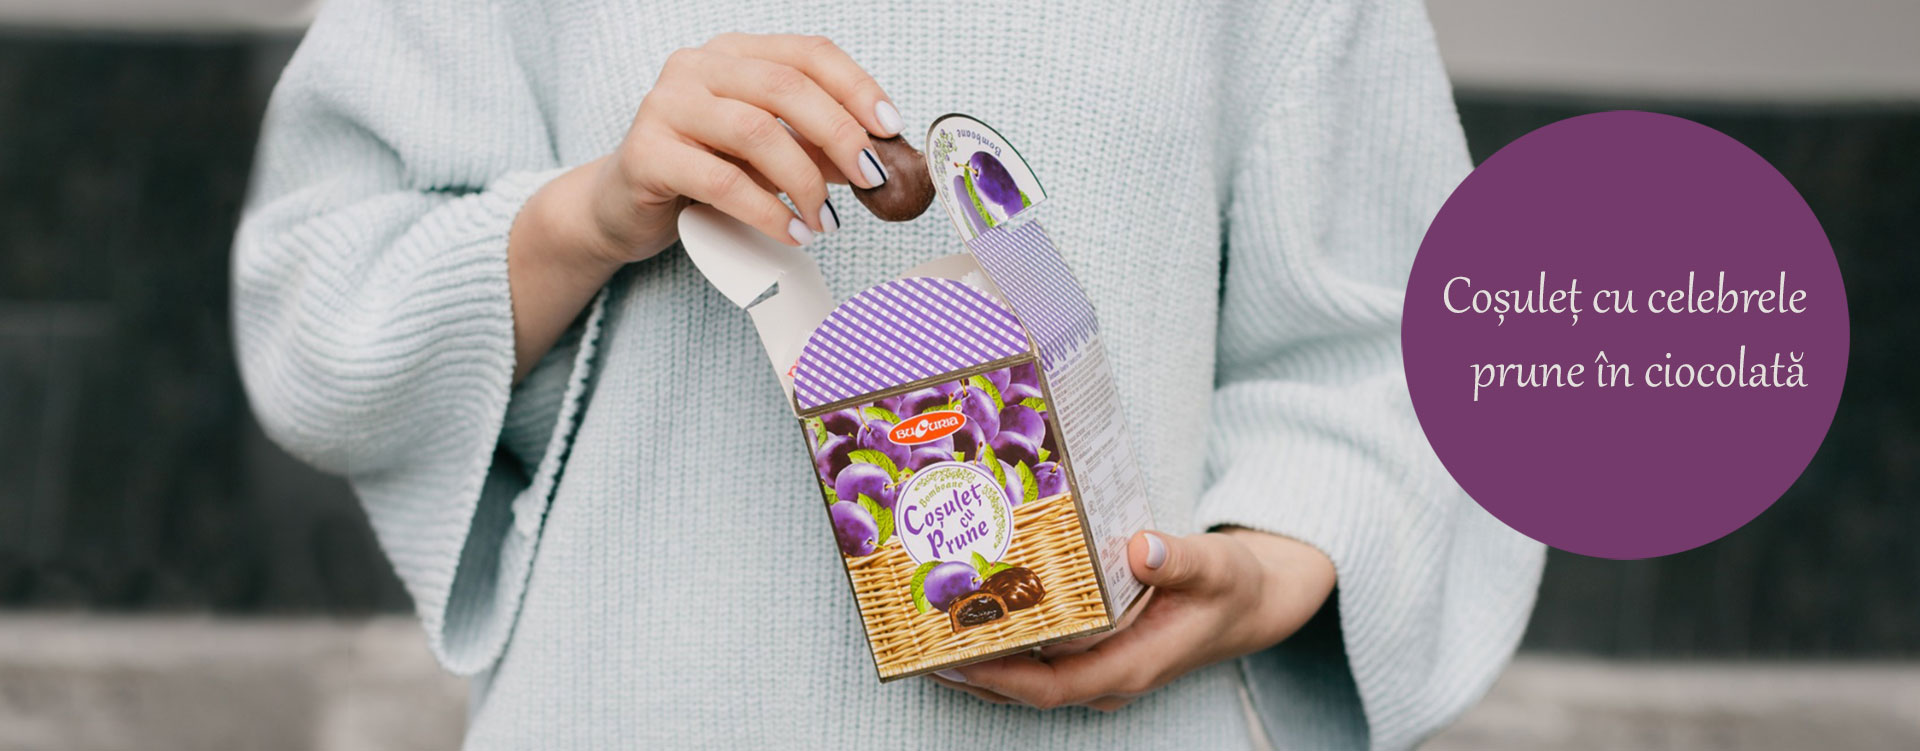 Prune in ciocolata